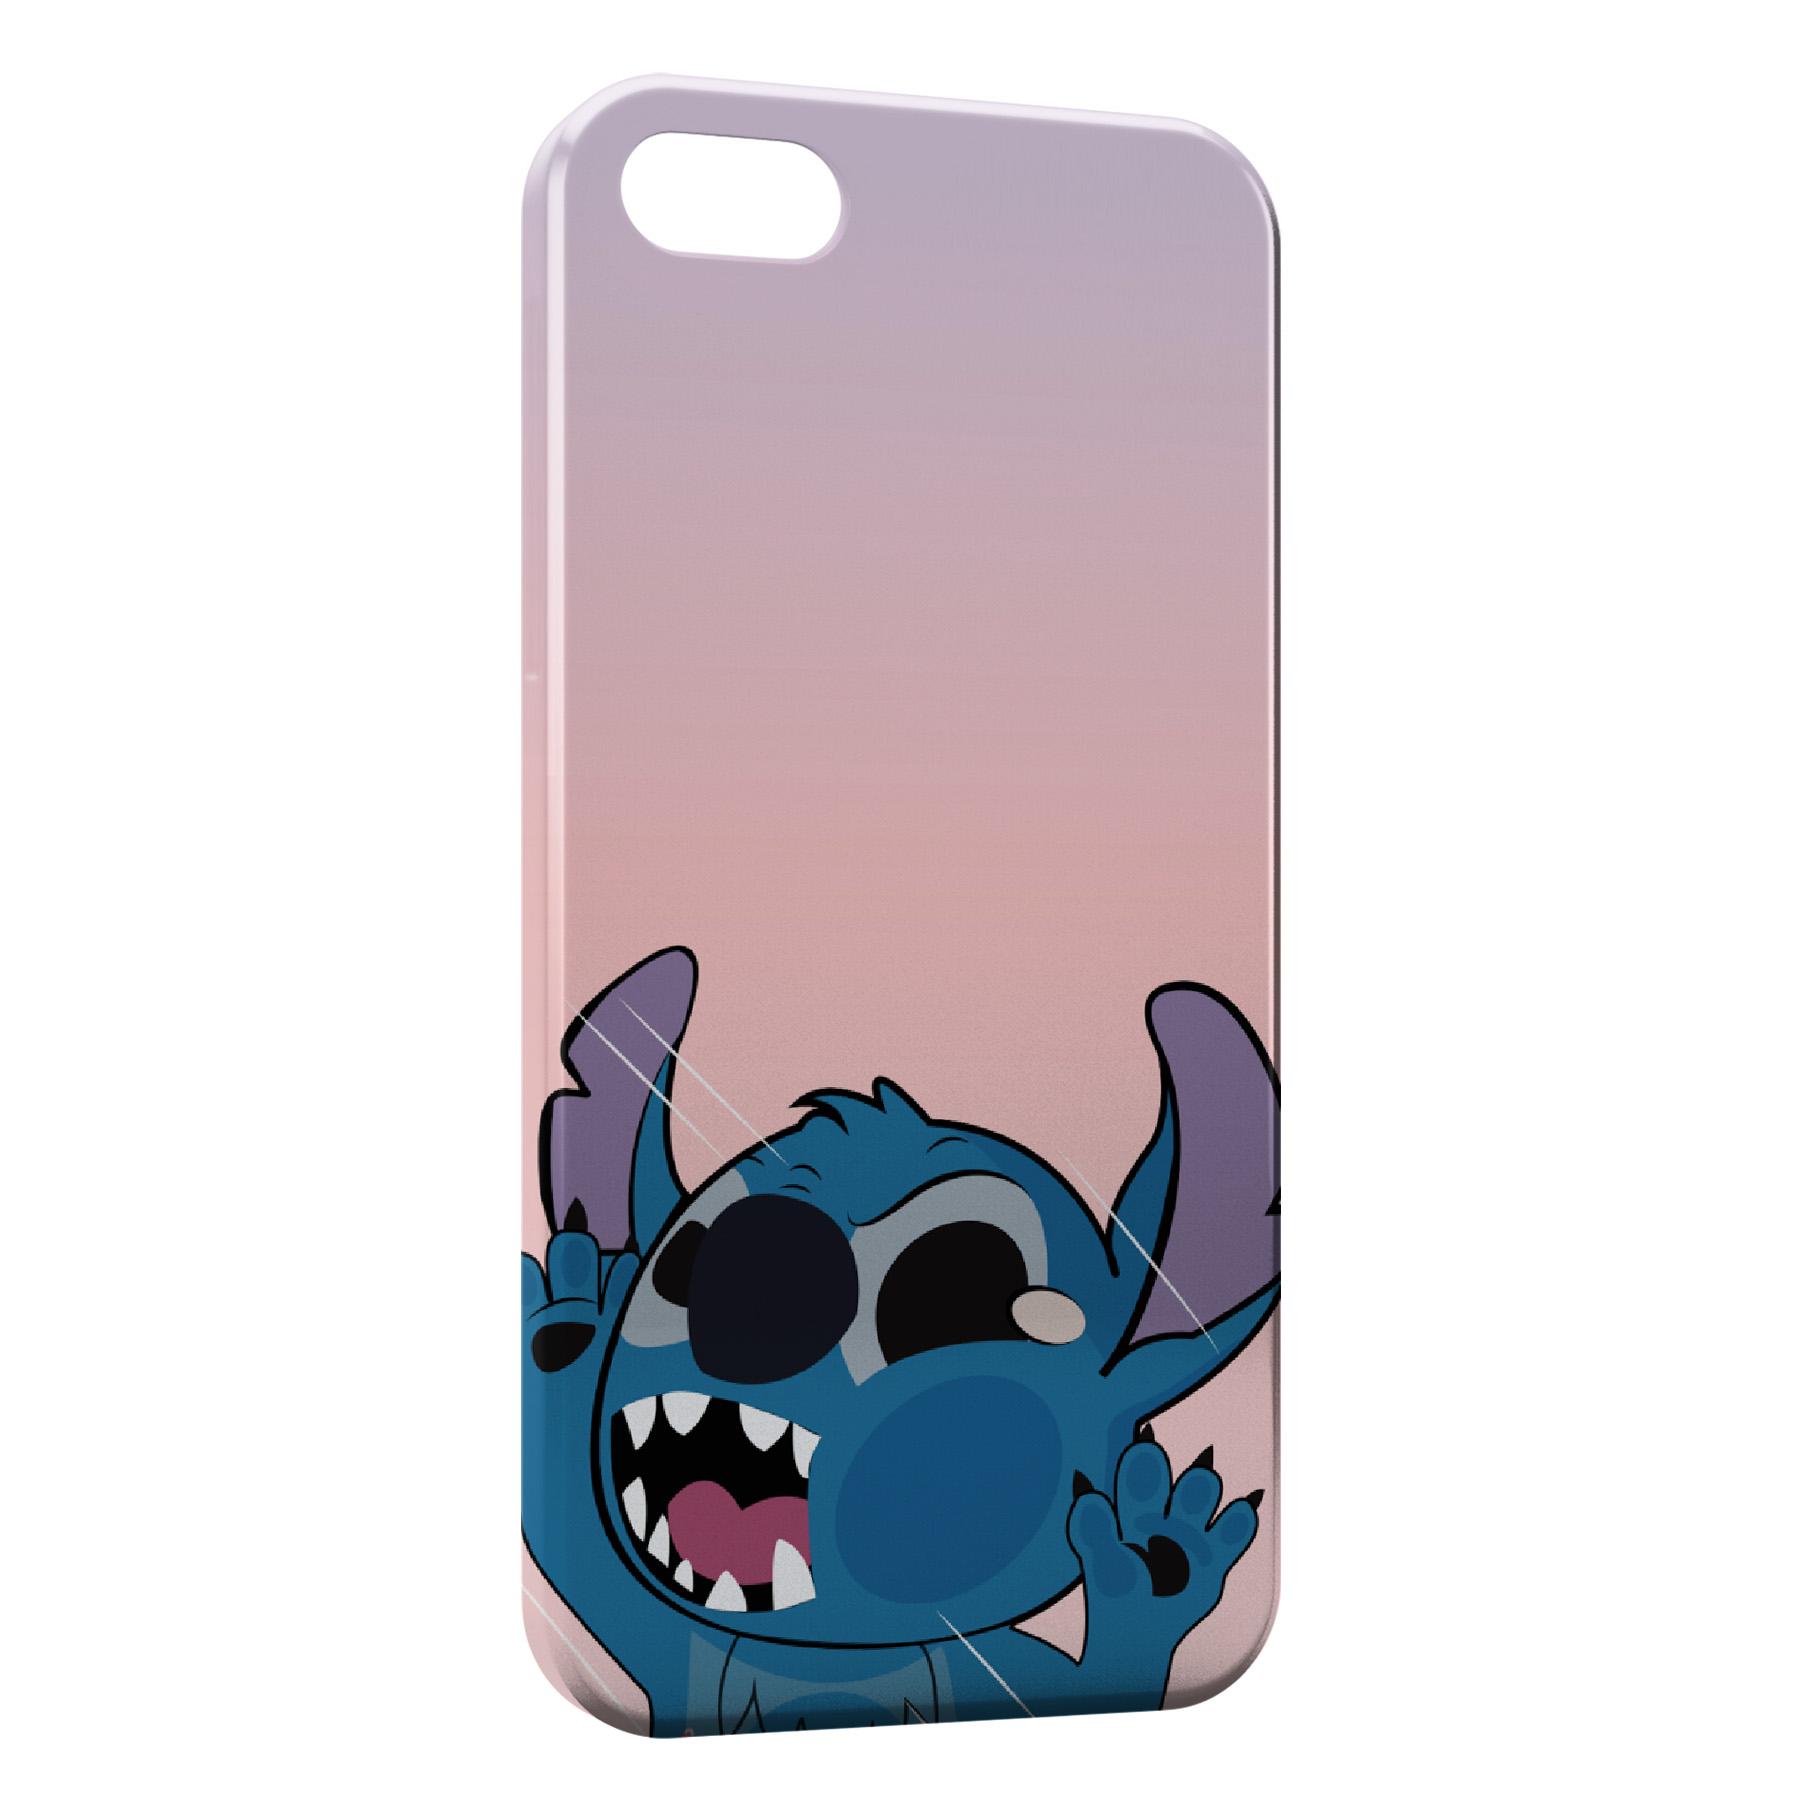 coque stitch iphone 7